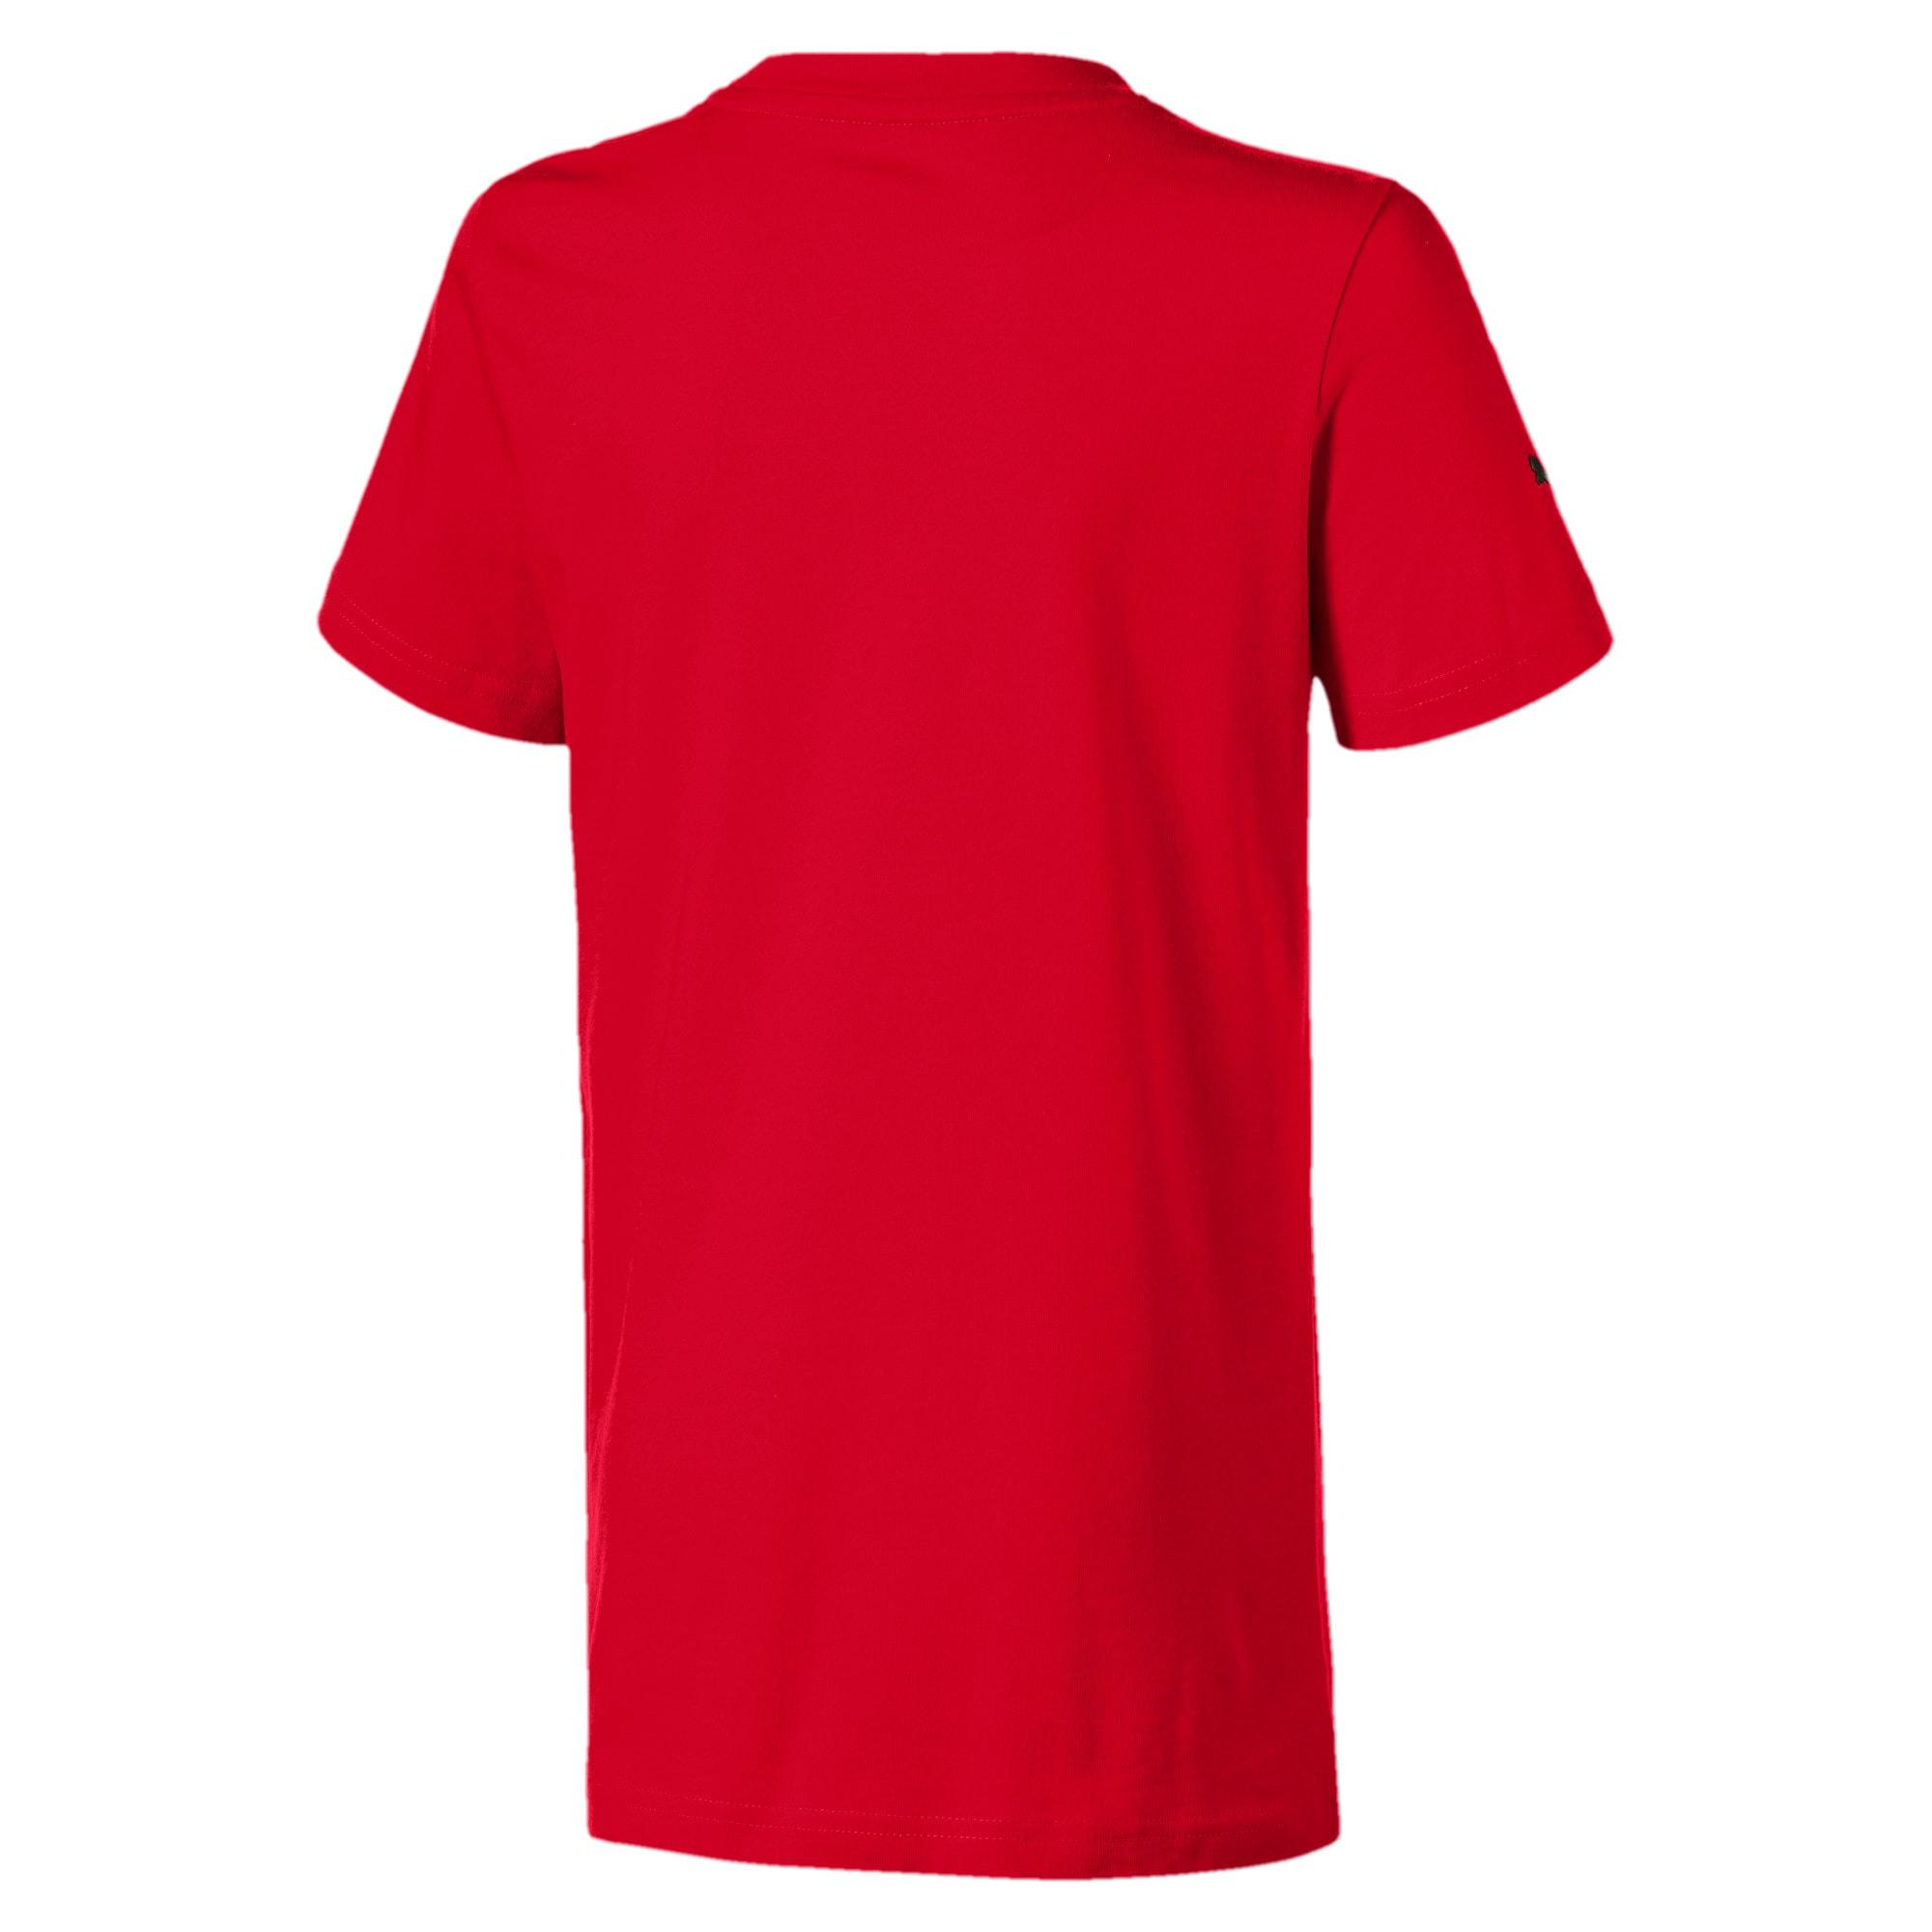 Miniatura 2 de Camiseta urbana Scuderia Ferraricon insignia grande para niño joven, Rosso Corsa, mediano